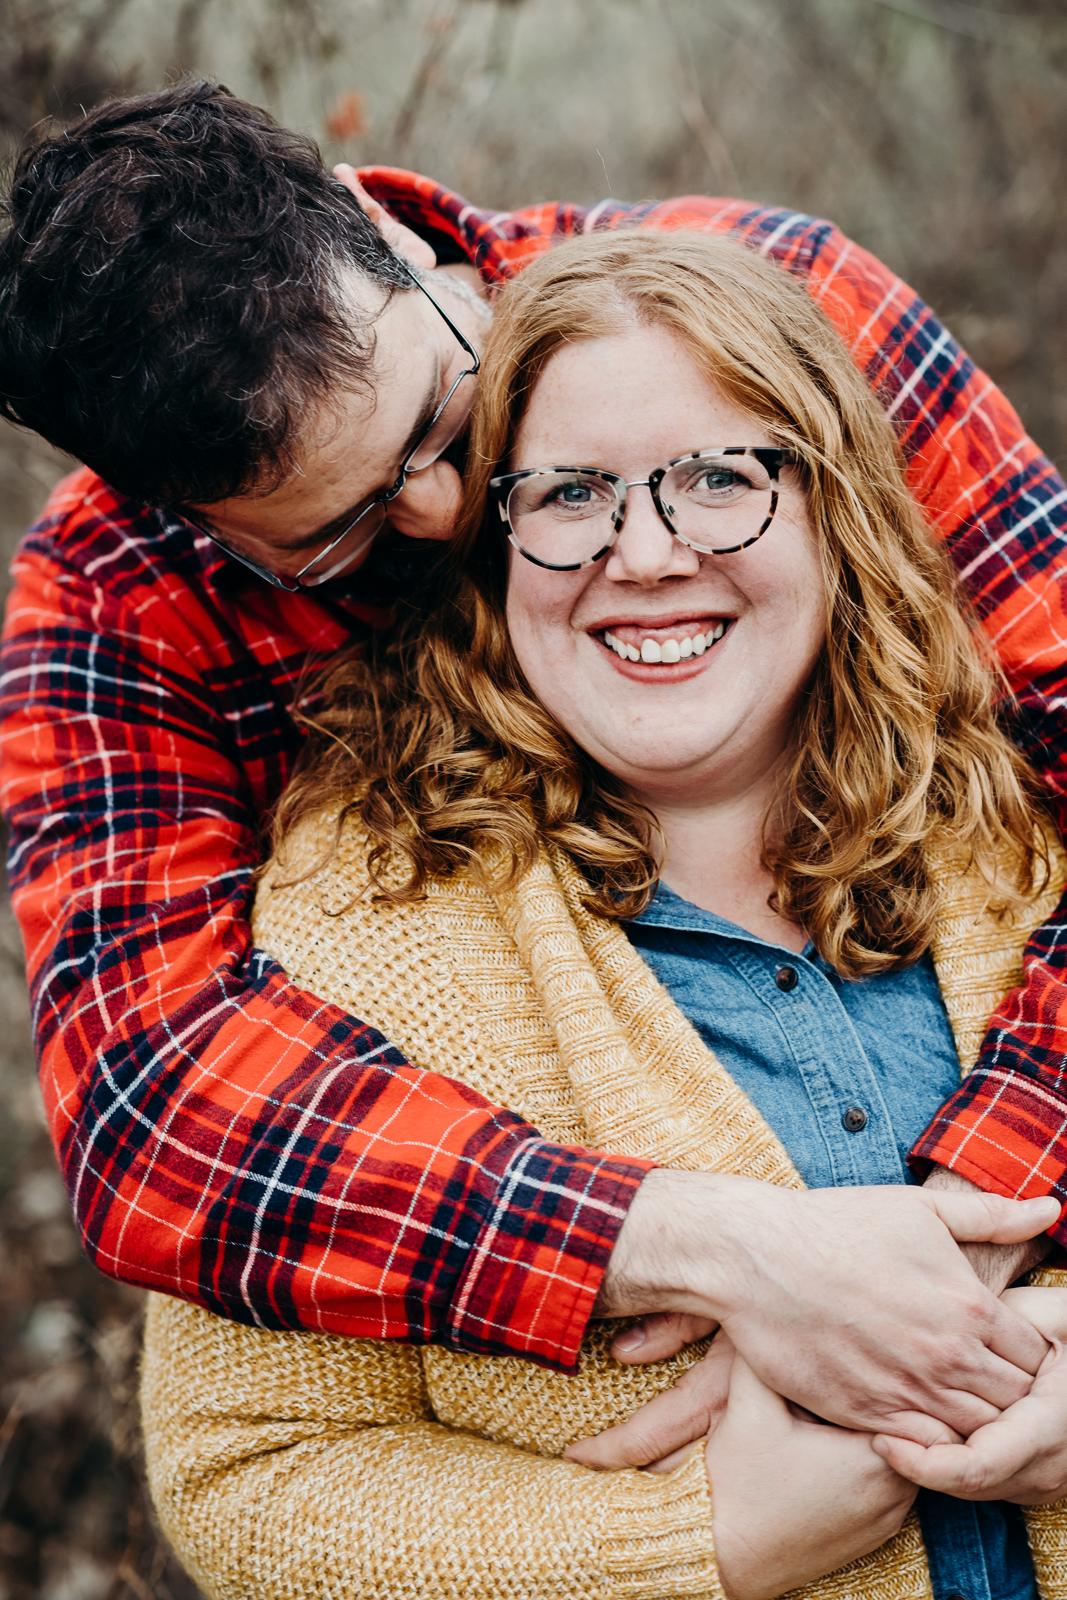 Man gives his fiancé a bear hug from behind.